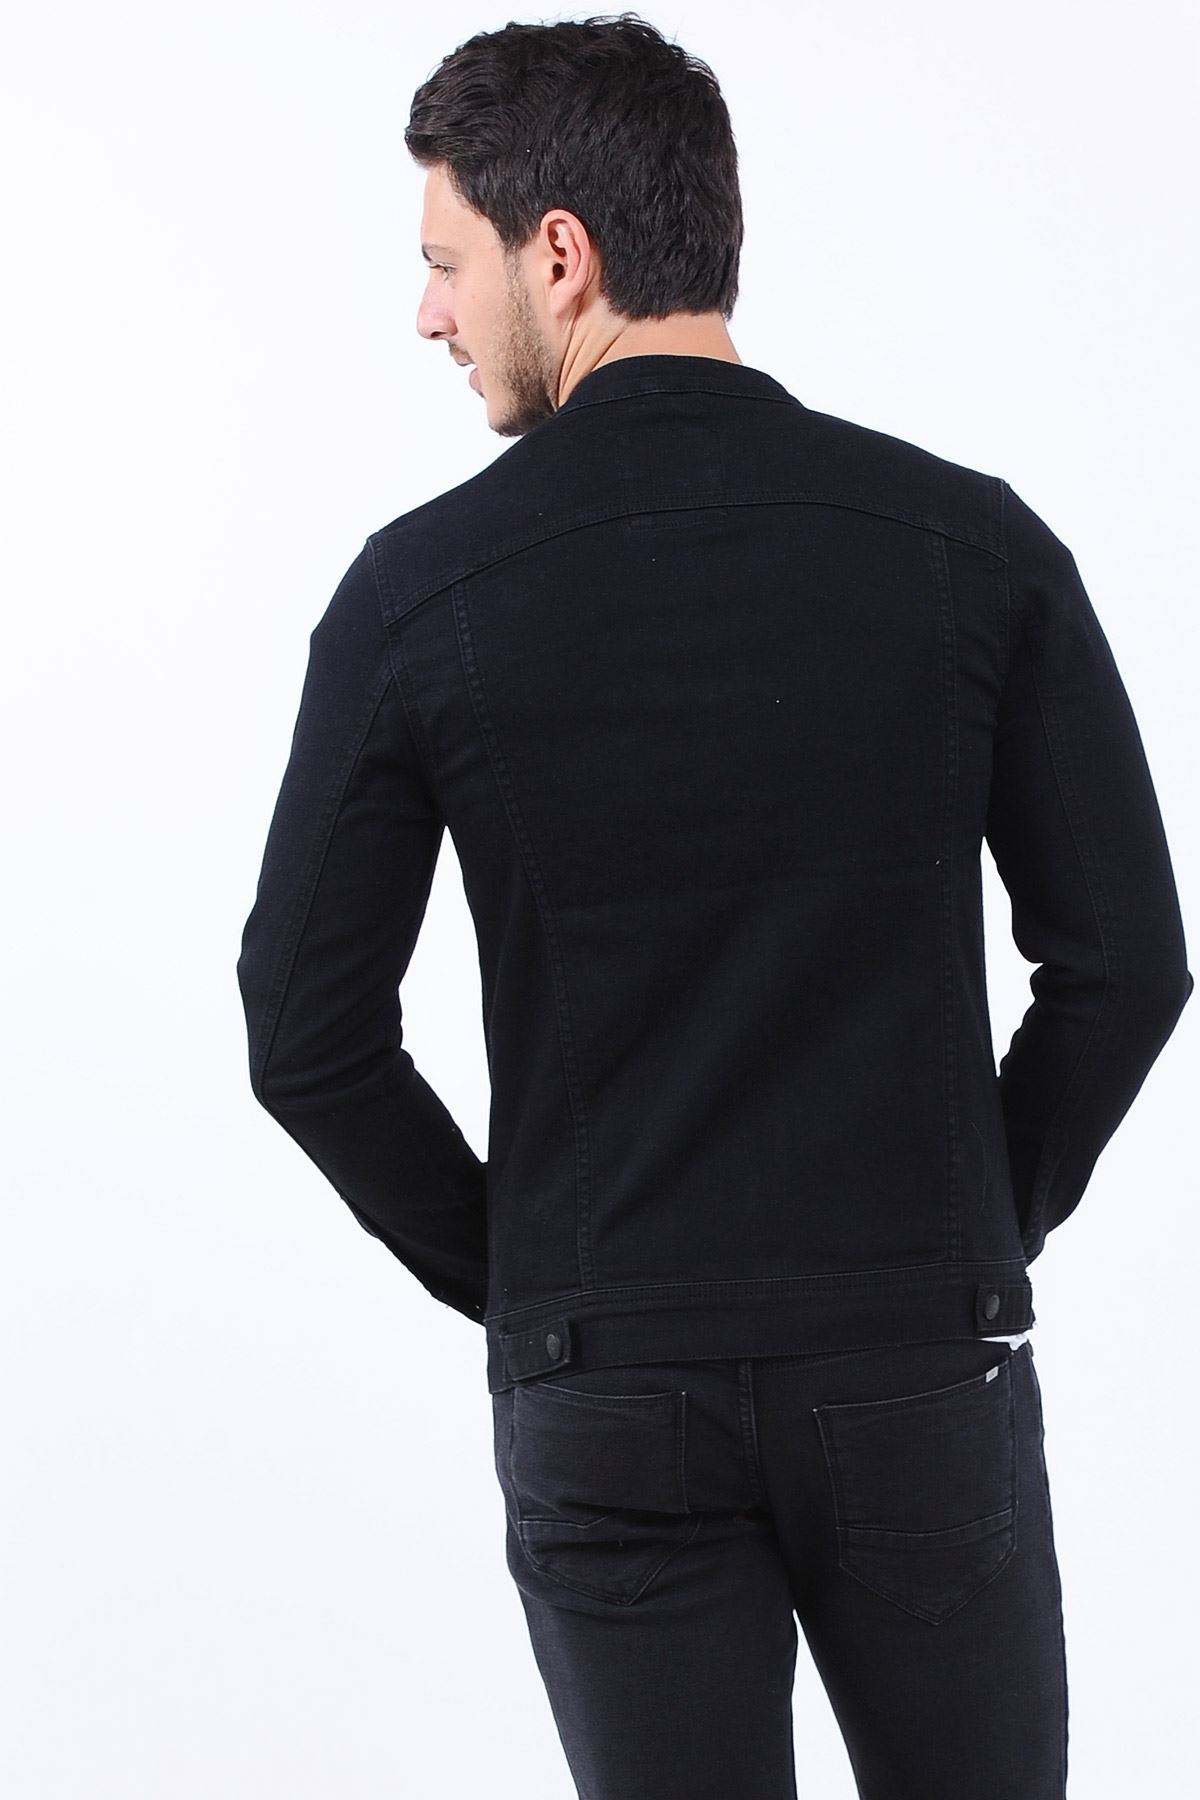 Tek Fermuarlı Cep Erkek Kot Ceket Siyah